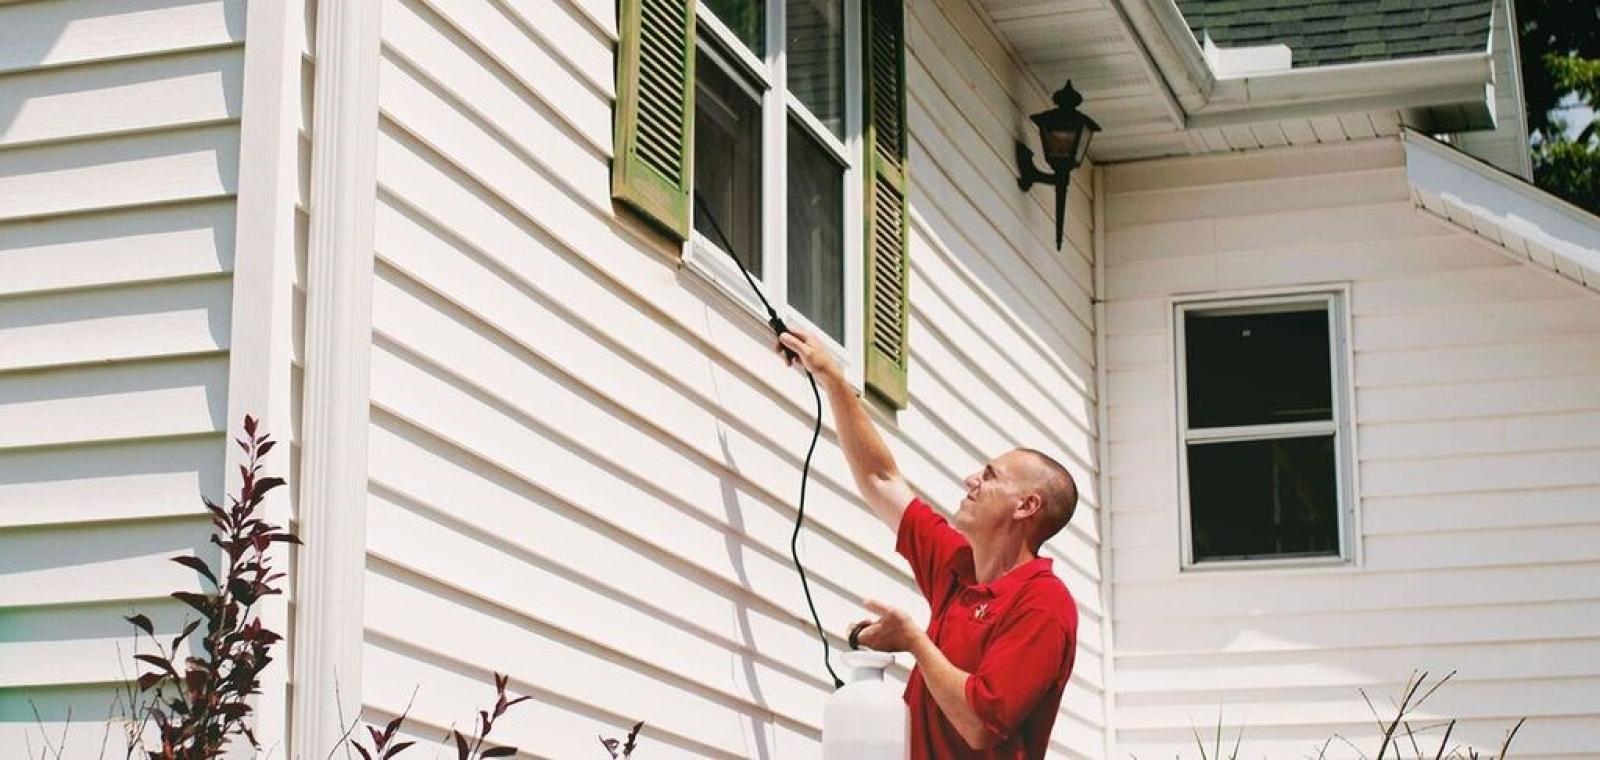 larry spraying window